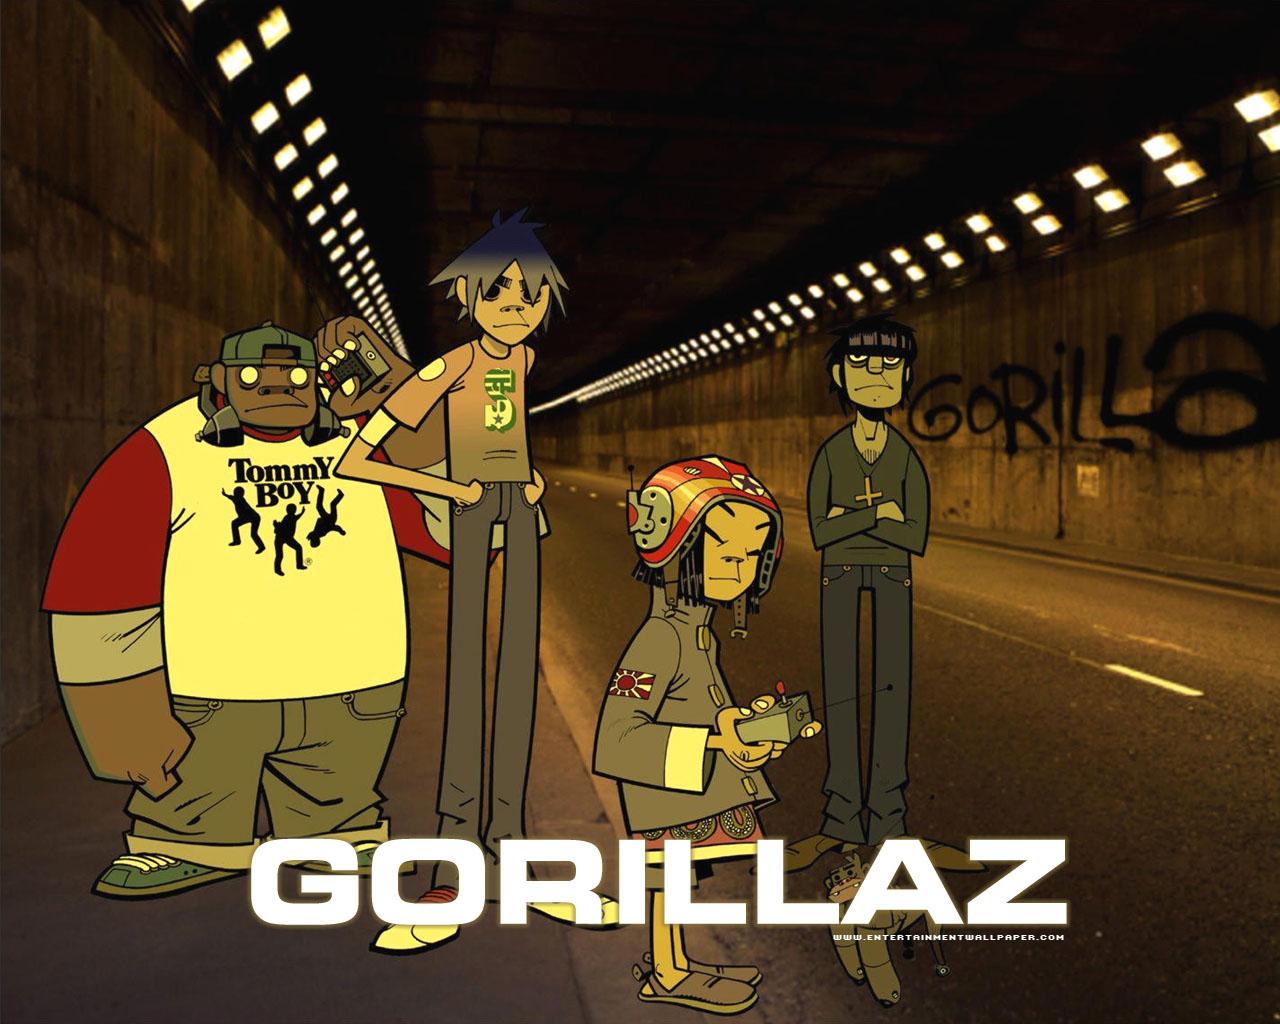 Gorillaz Wallpaper gorillaz - gorillaz Wallpaper